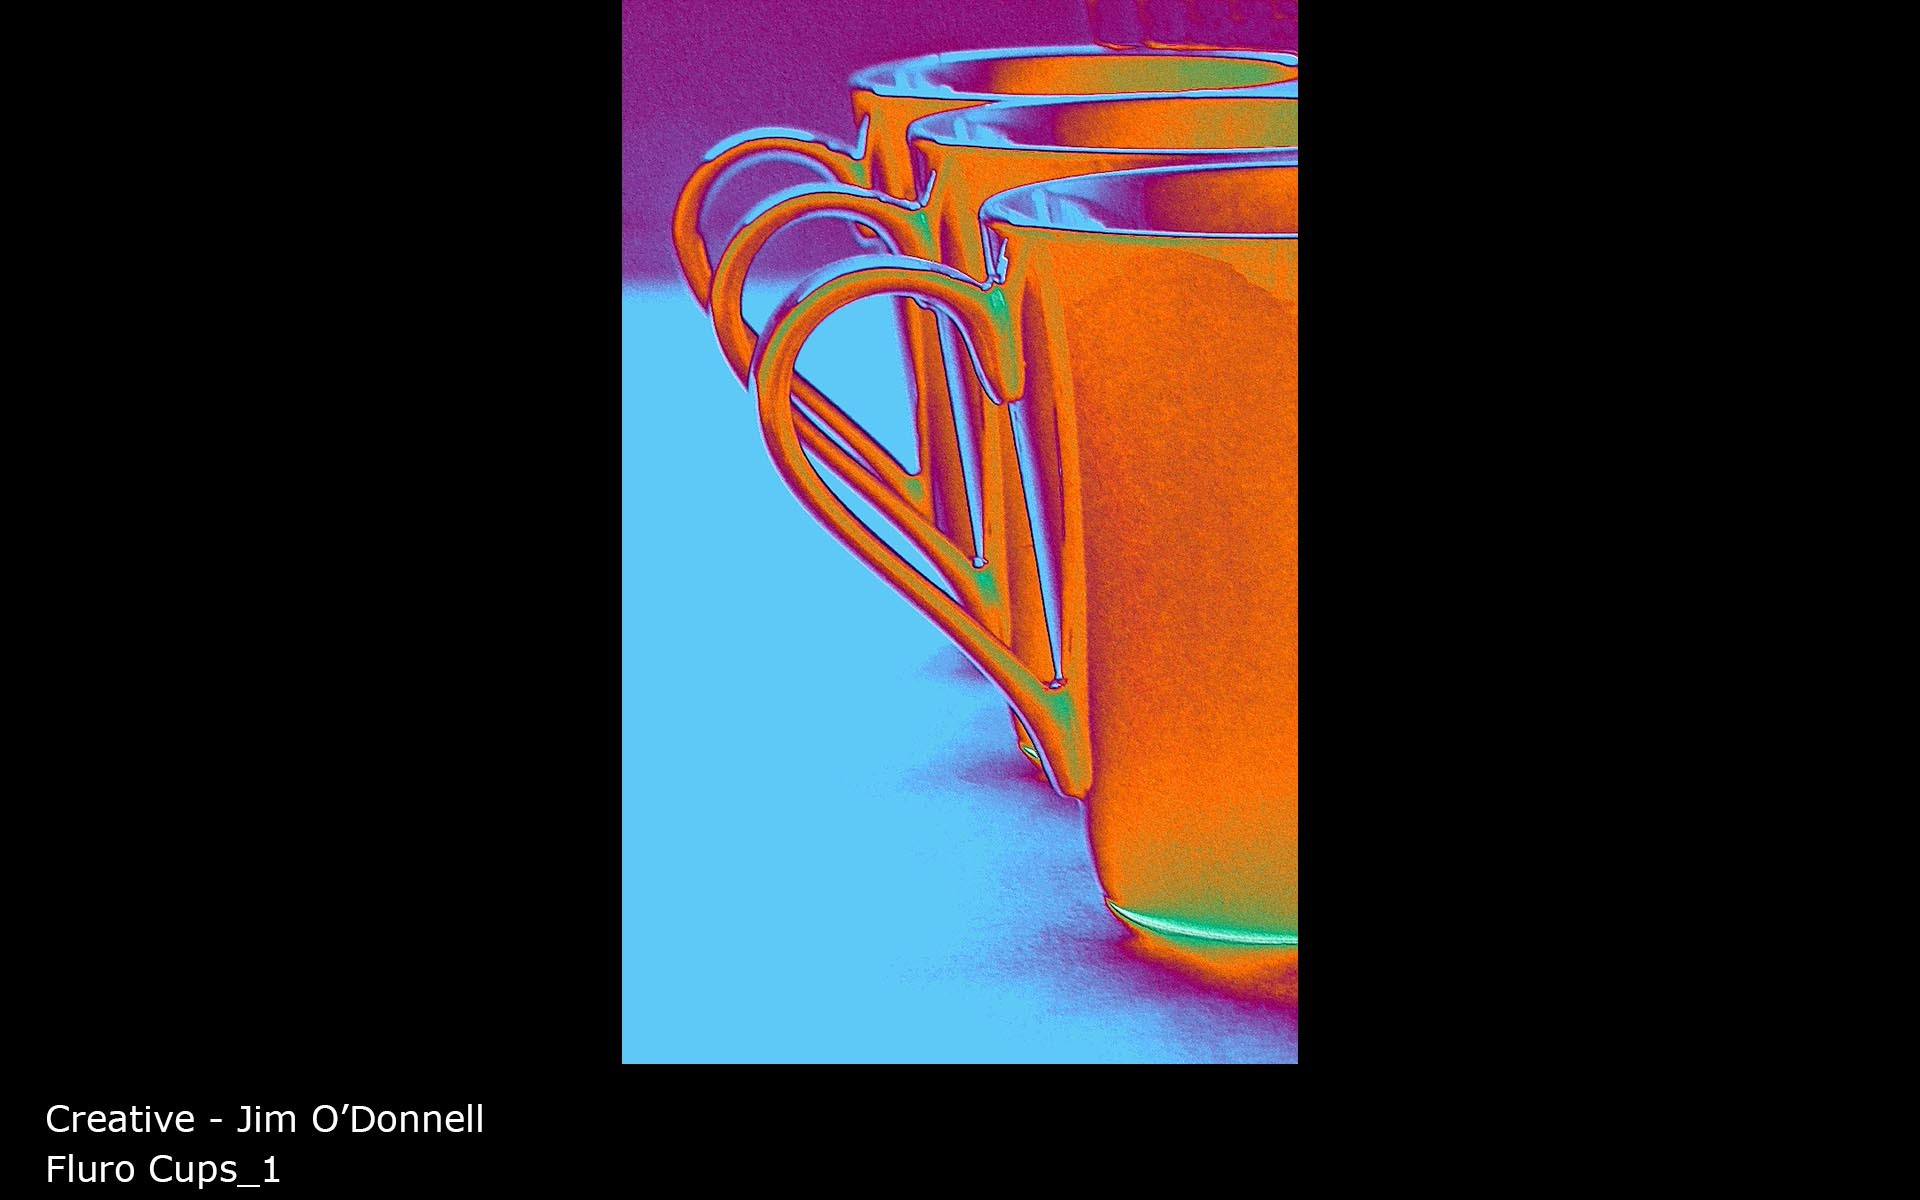 Fluro Cups_1 - Jim O'Donnell